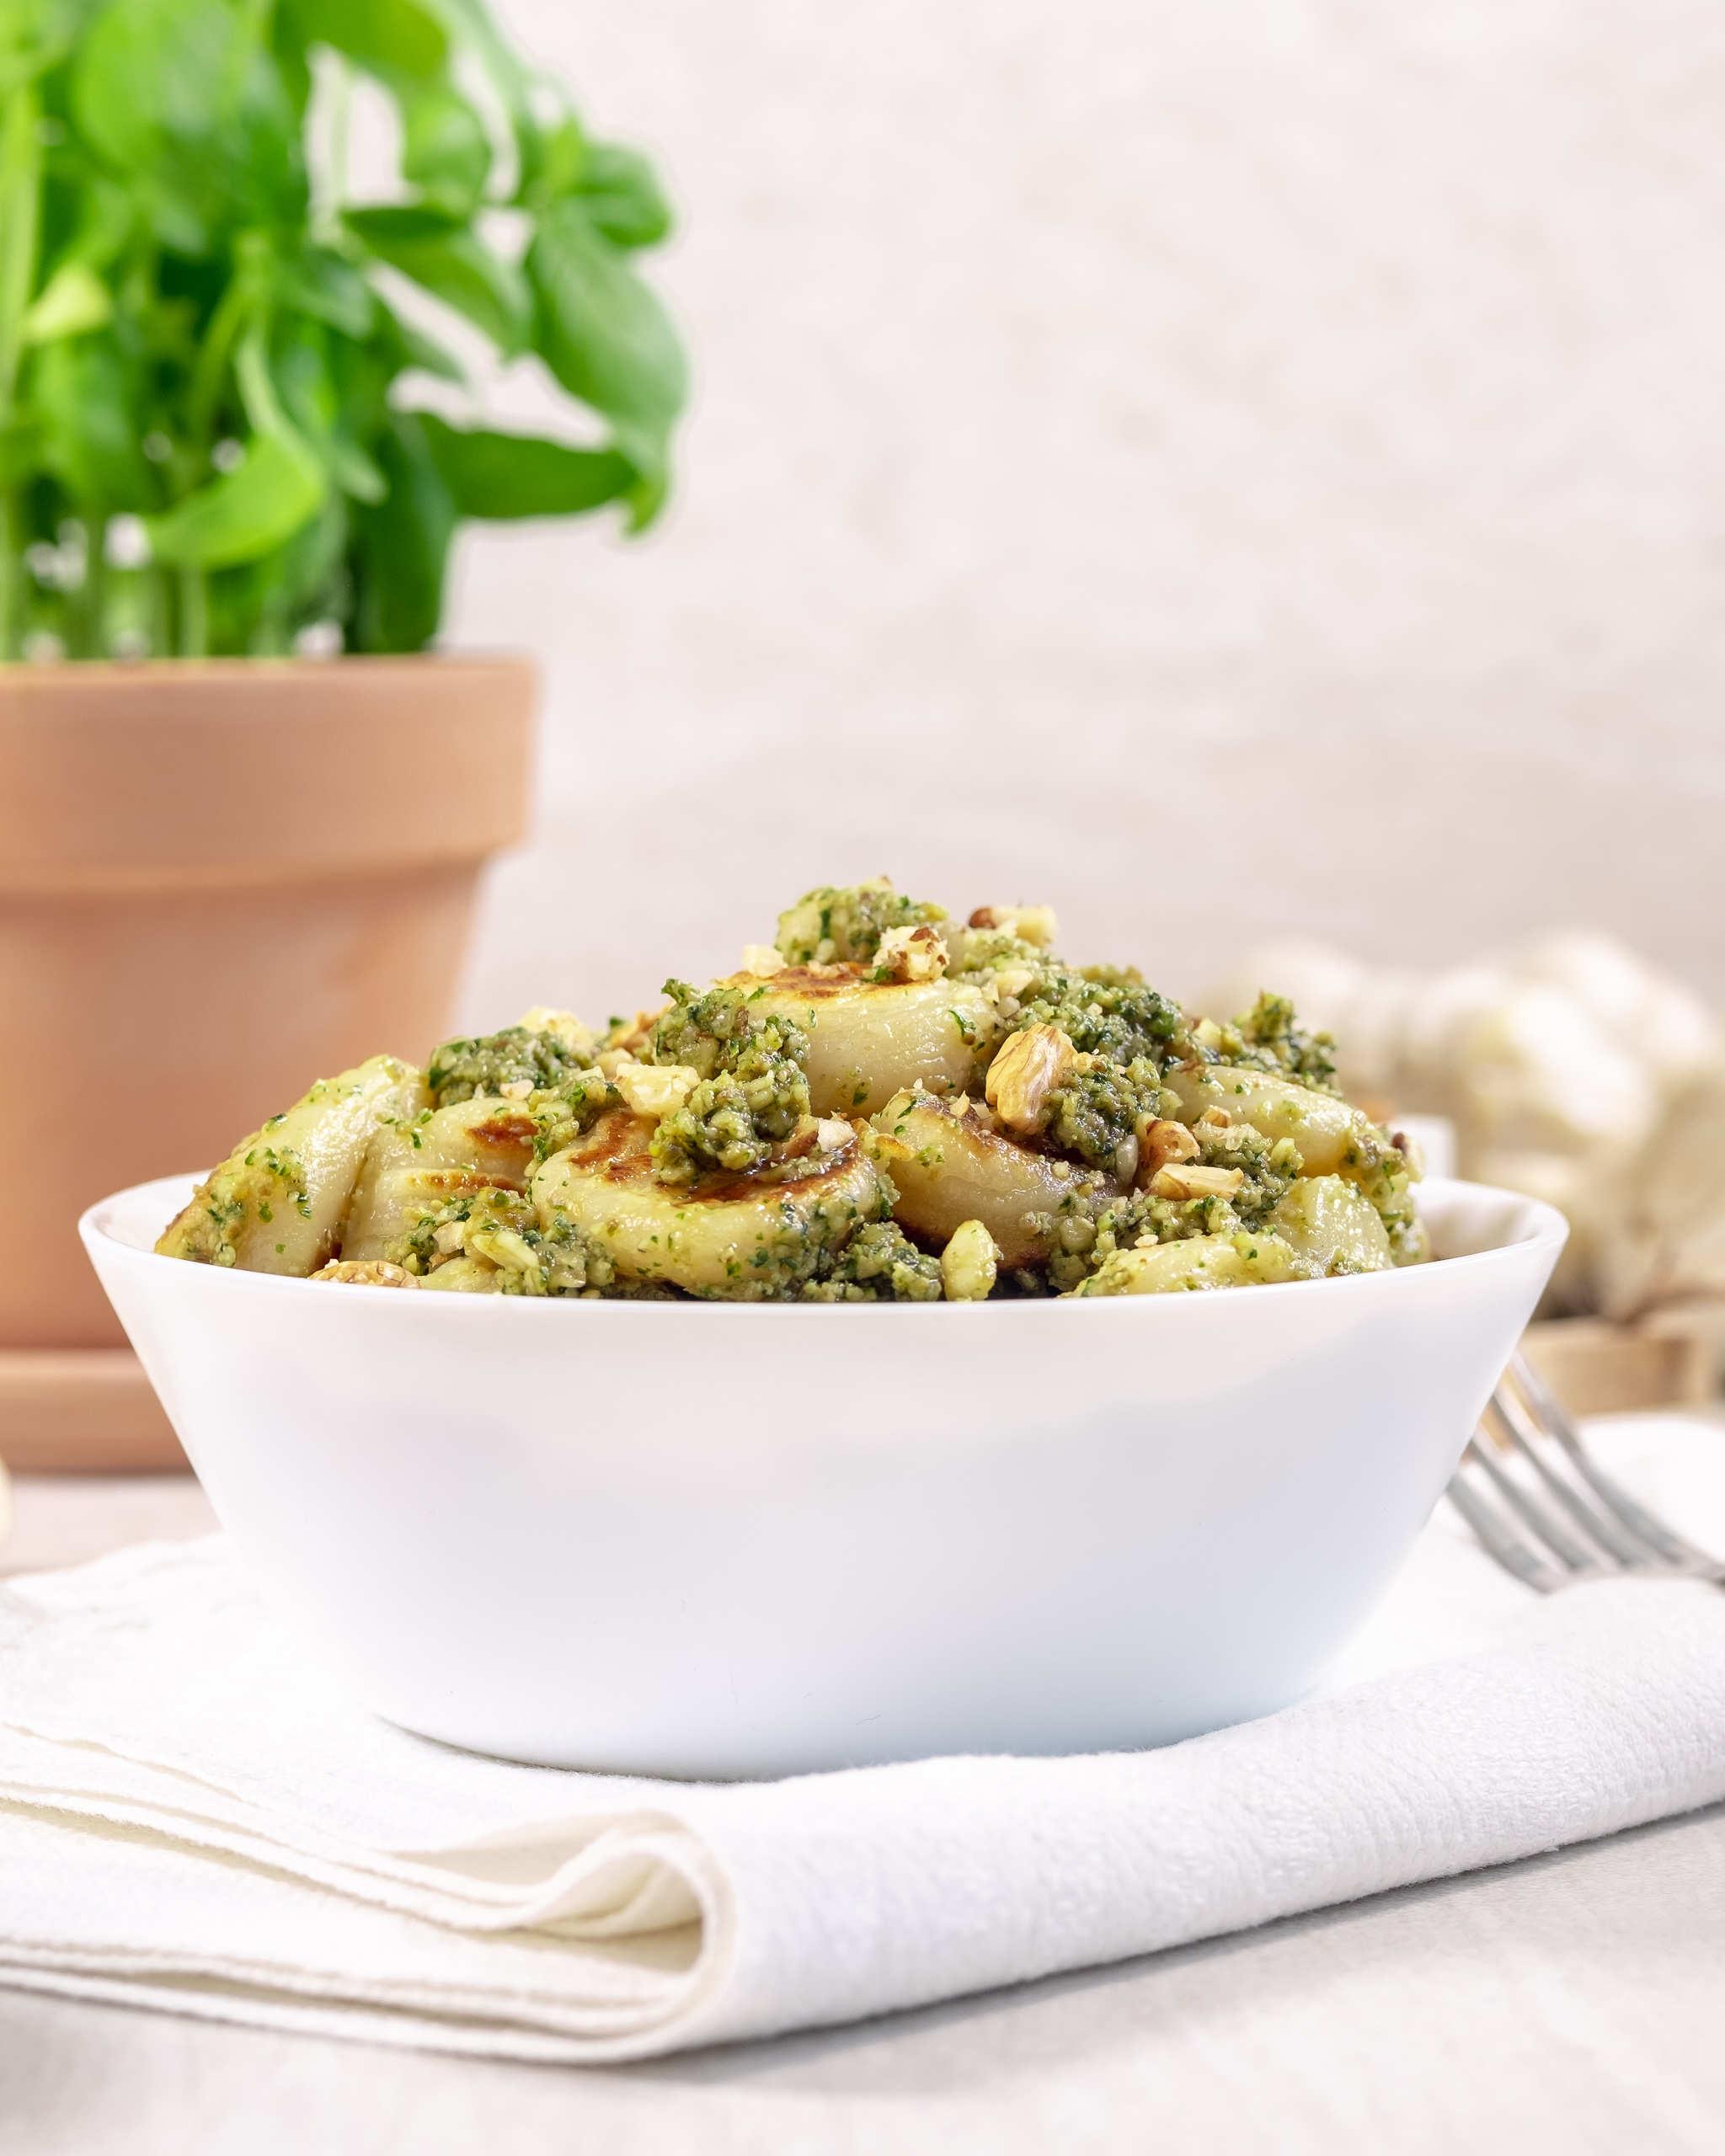 Vegan homemade gnocchi recipe